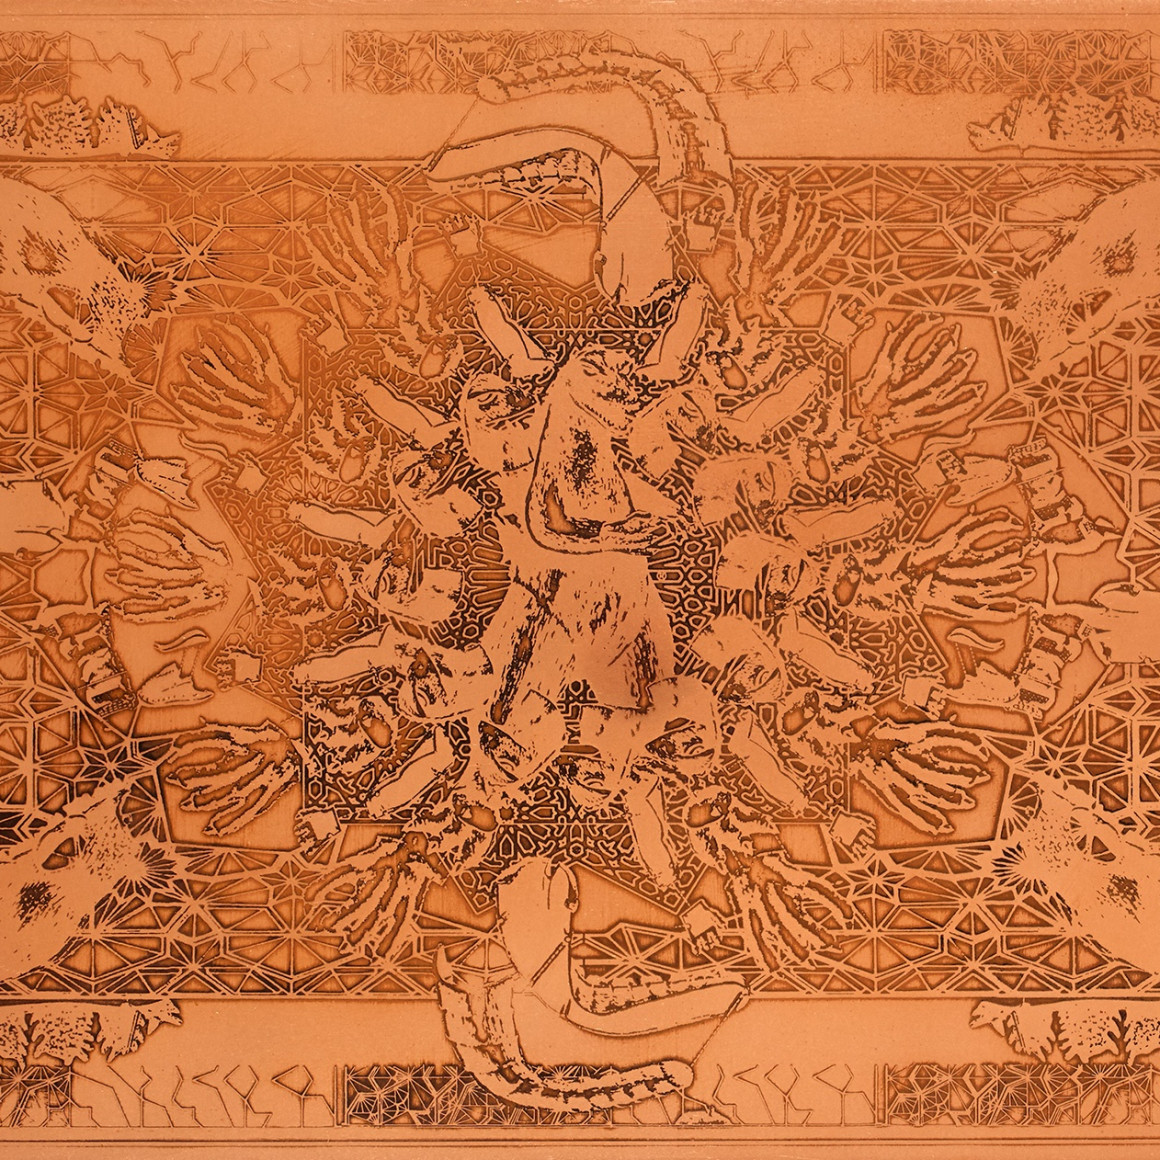 Zhivago Duncan, Imaginary Transcendence, 2014